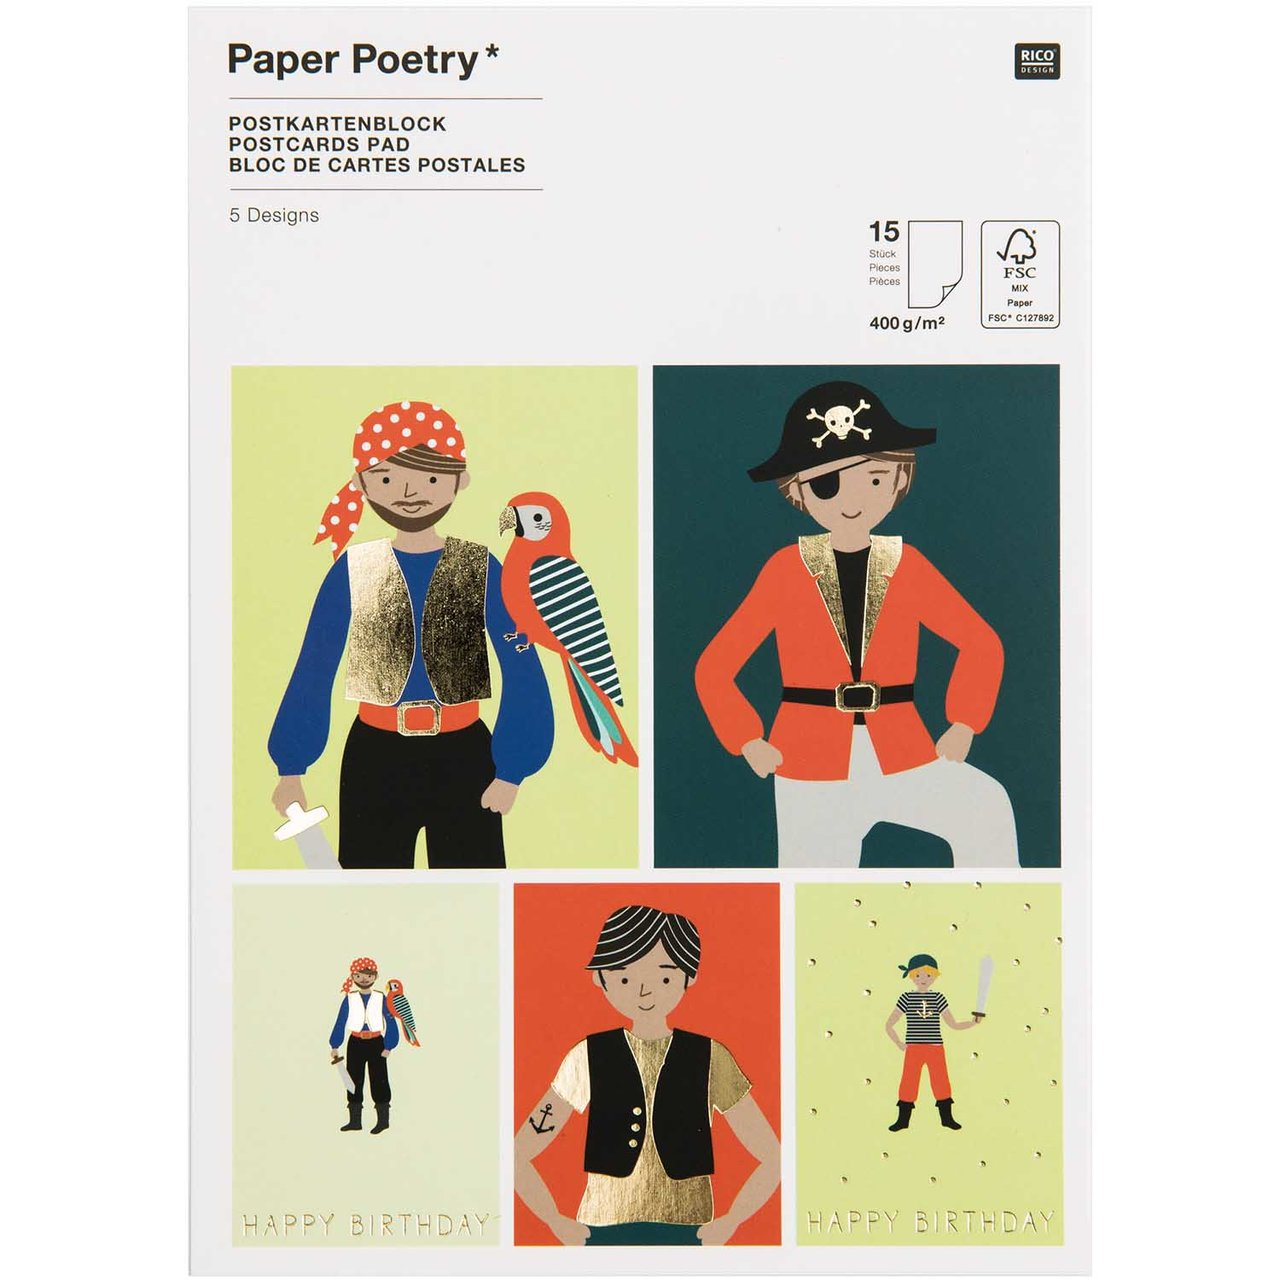 Paper Poetry Postkartenblock Pirat 400g/m² 15 S...